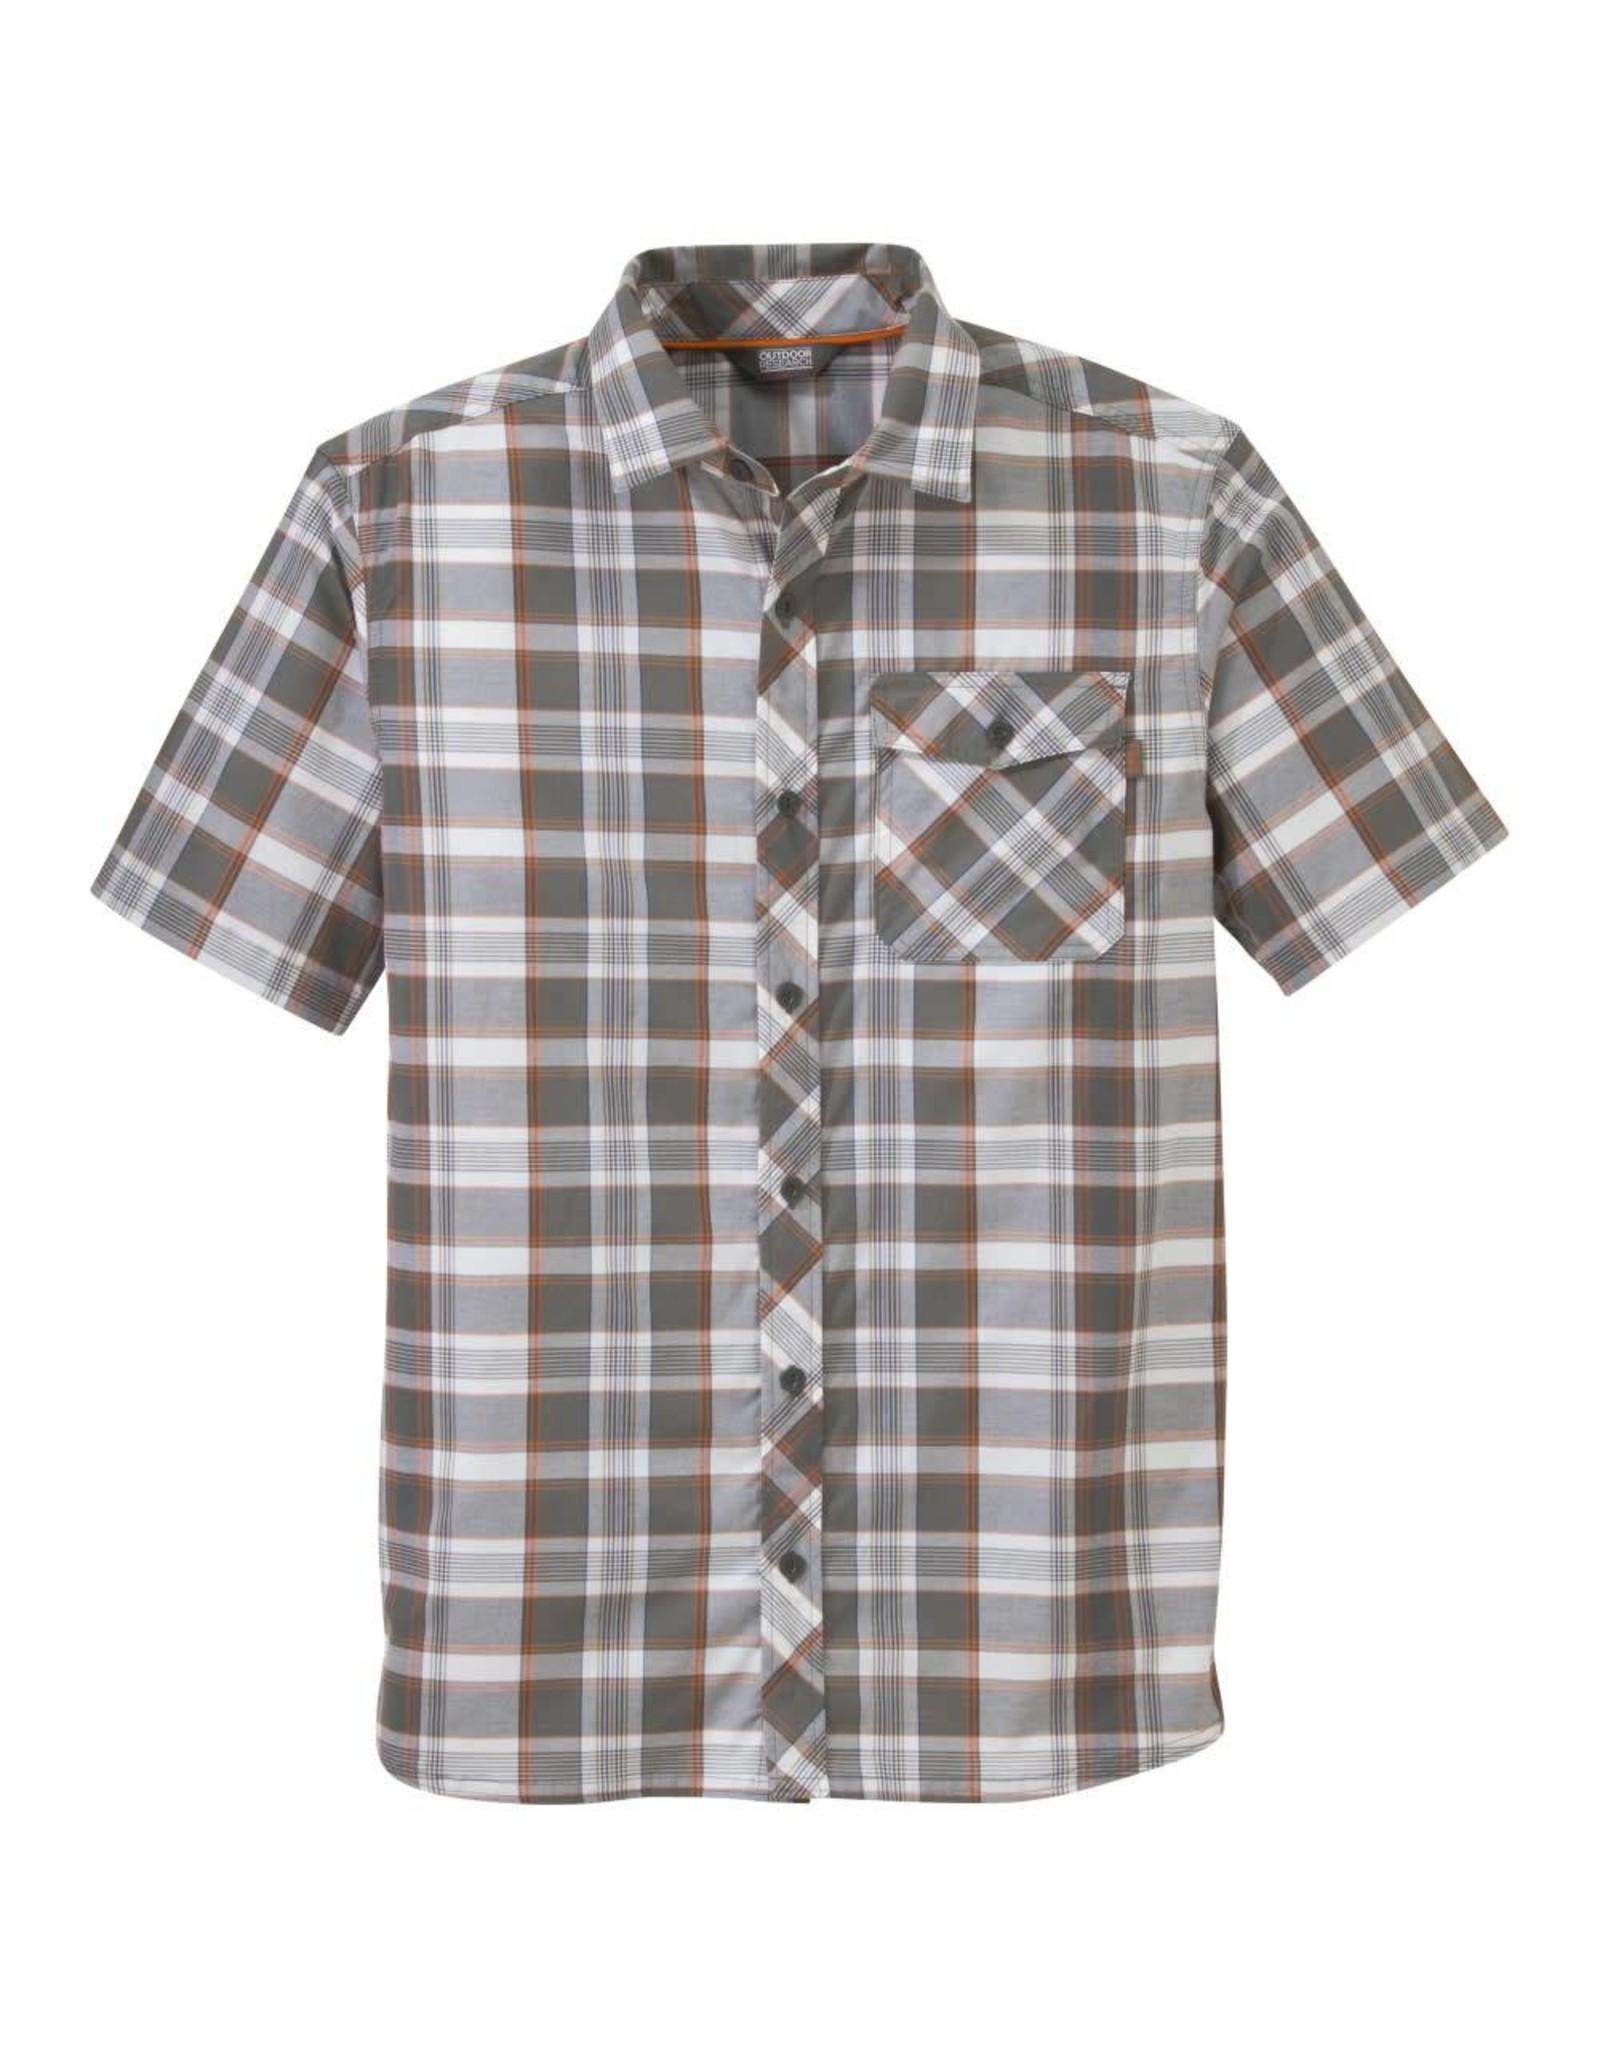 Outdoor Research Outdoor Research Pale Ale Shirt - Men